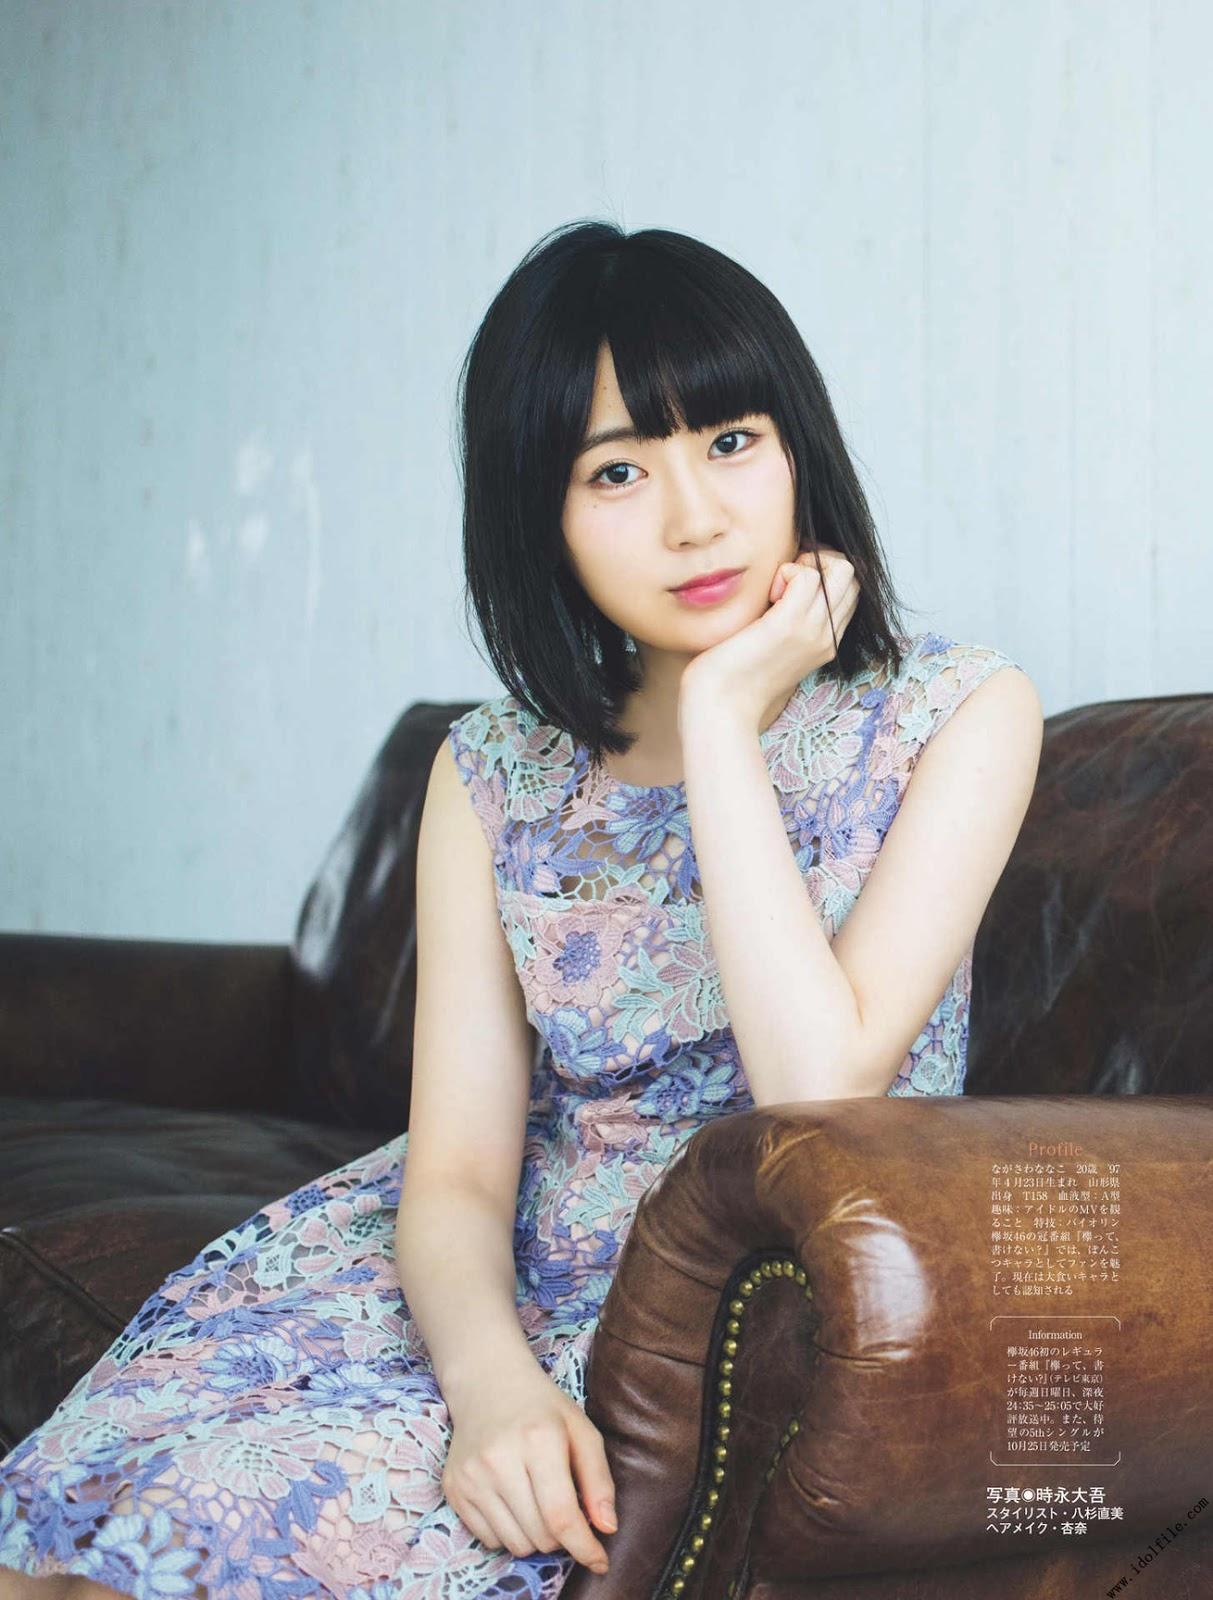 Nagasawa Nanako 長沢菜々香, Platinum FLASH 2017 Vol.01 (プラチナフラッシュ 2017 Vol.1)